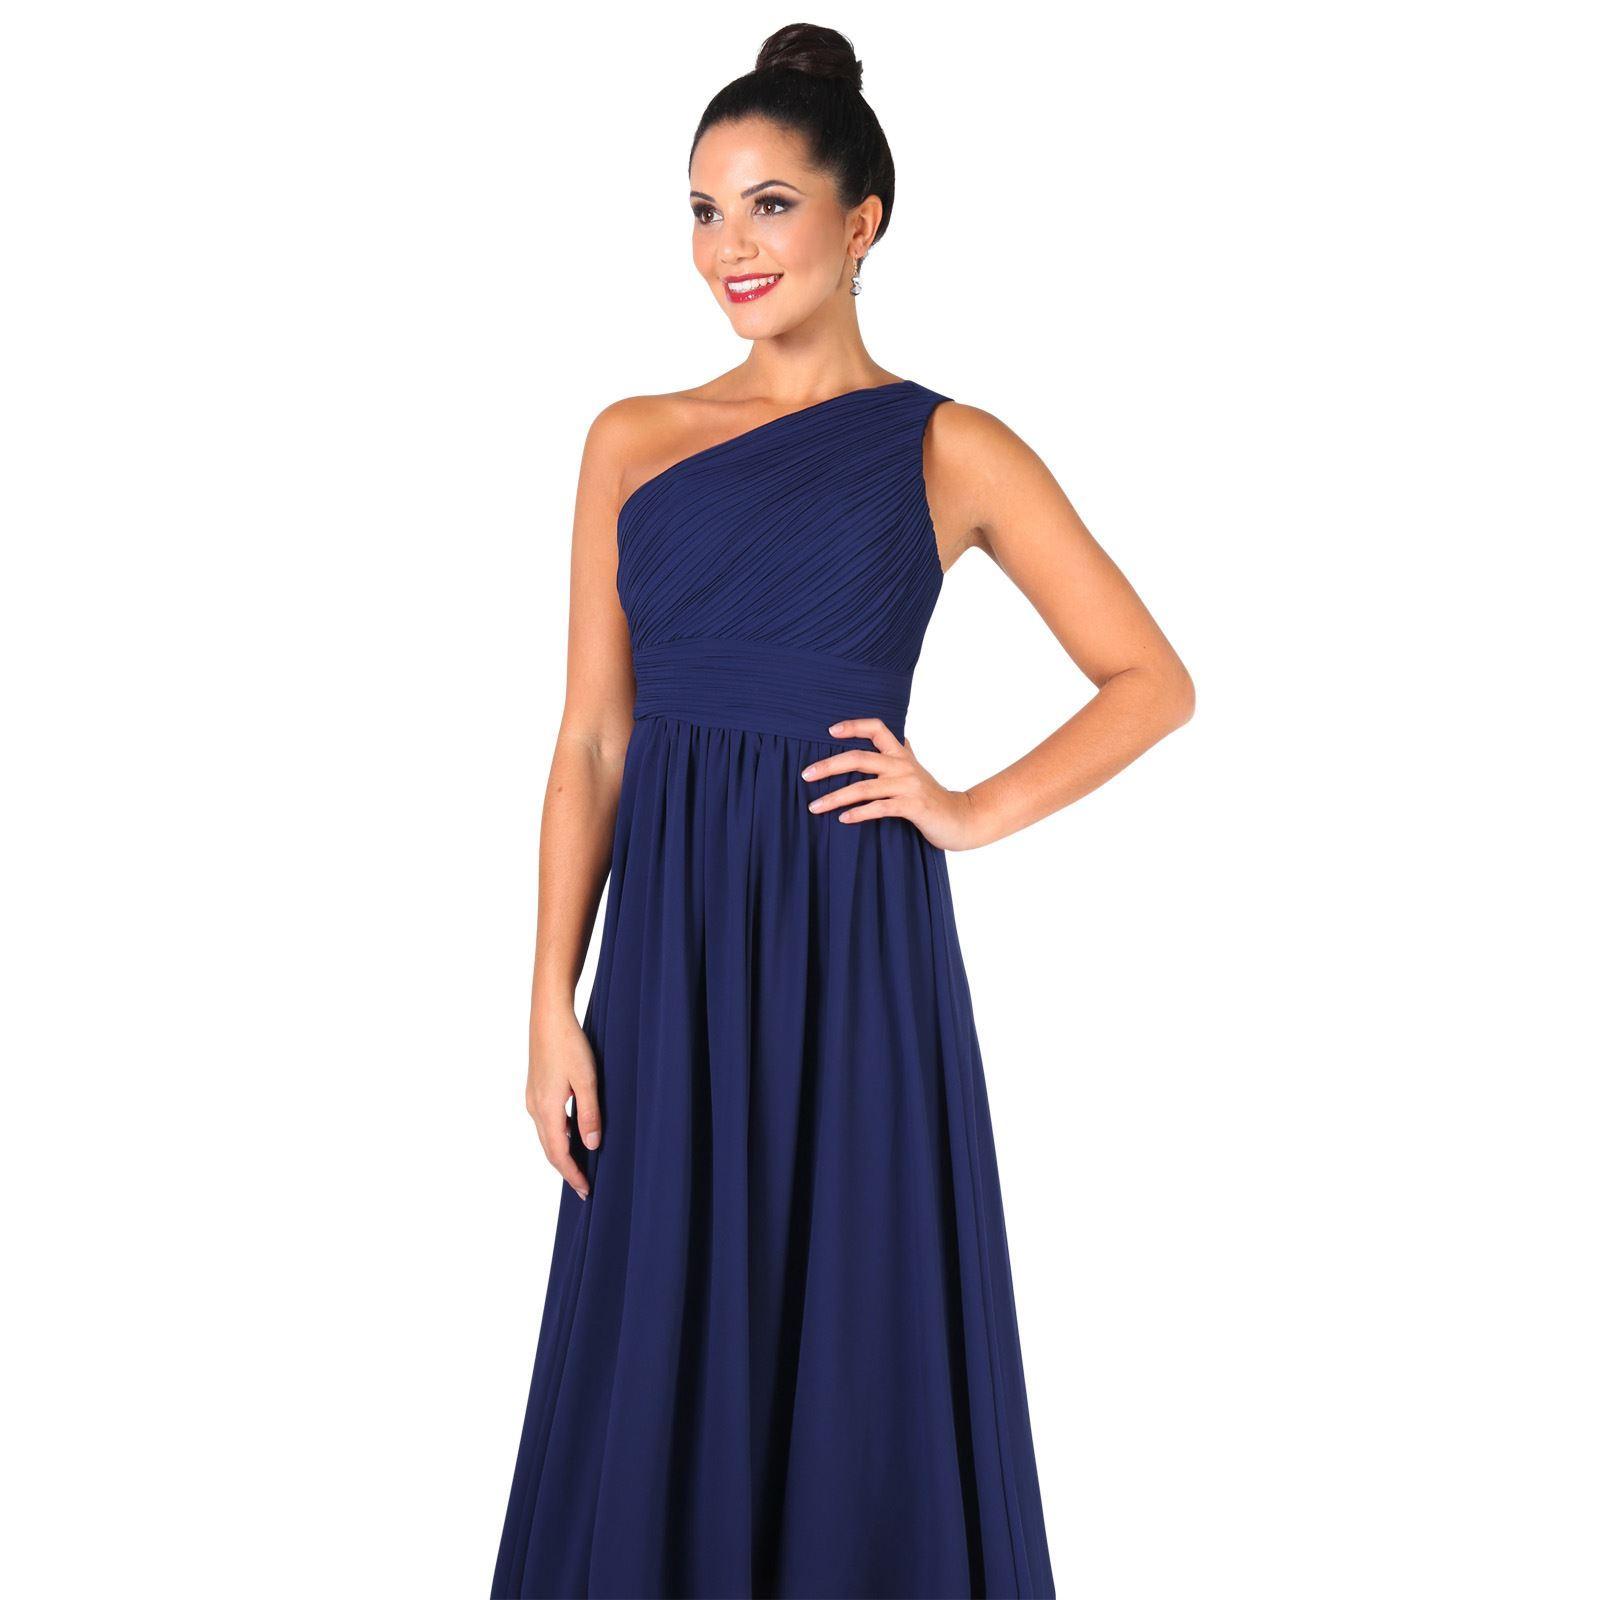 Womens-Wedding-Bridesmaid-Prom-Dress-Formal-One-Off-Shoulder-Long-Evening-8-18 thumbnail 46